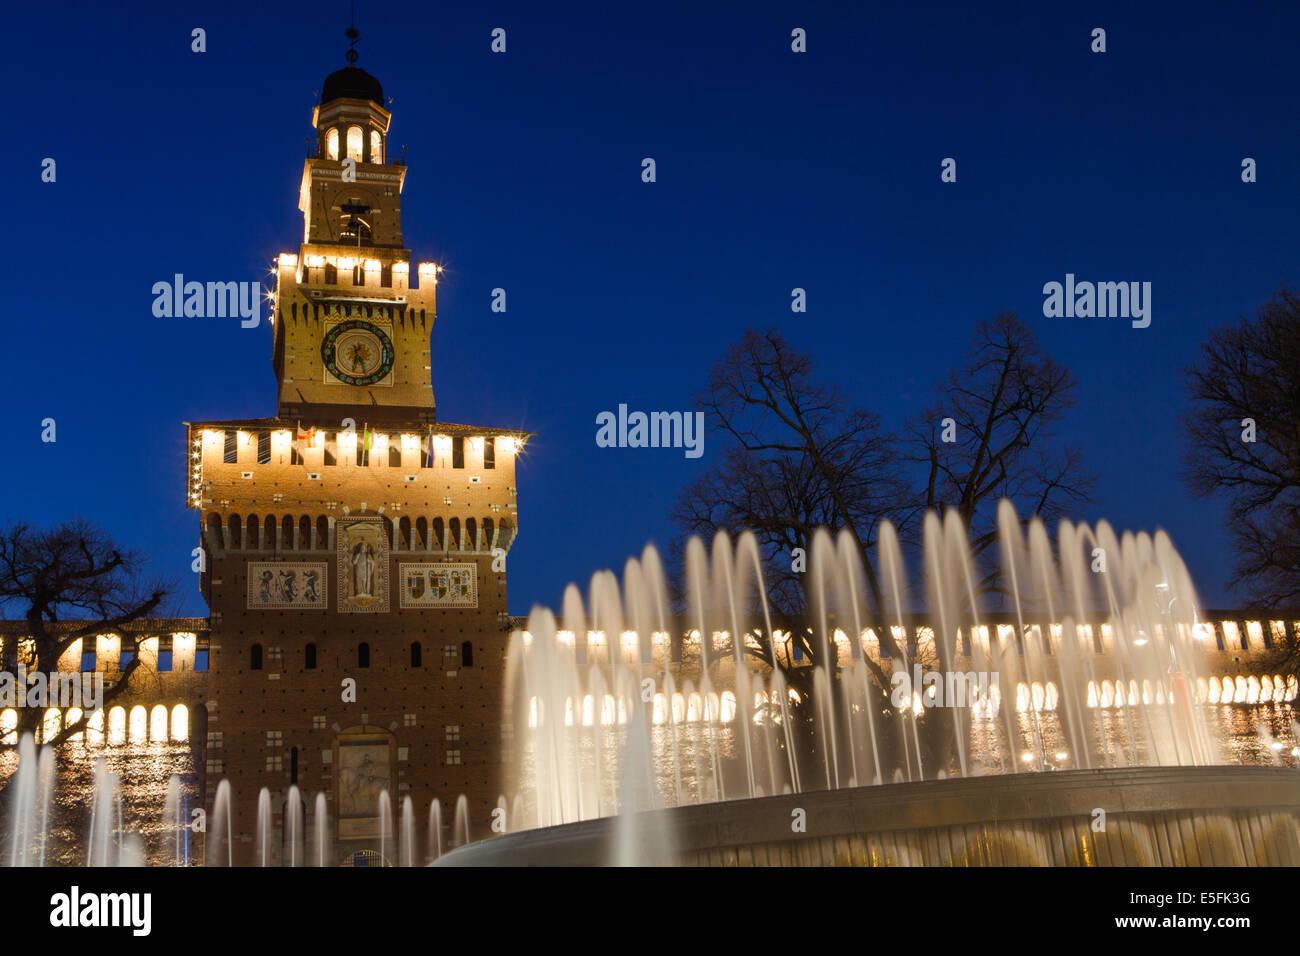 Sforzesco Castle by night in Milan, Italy - Stock Image